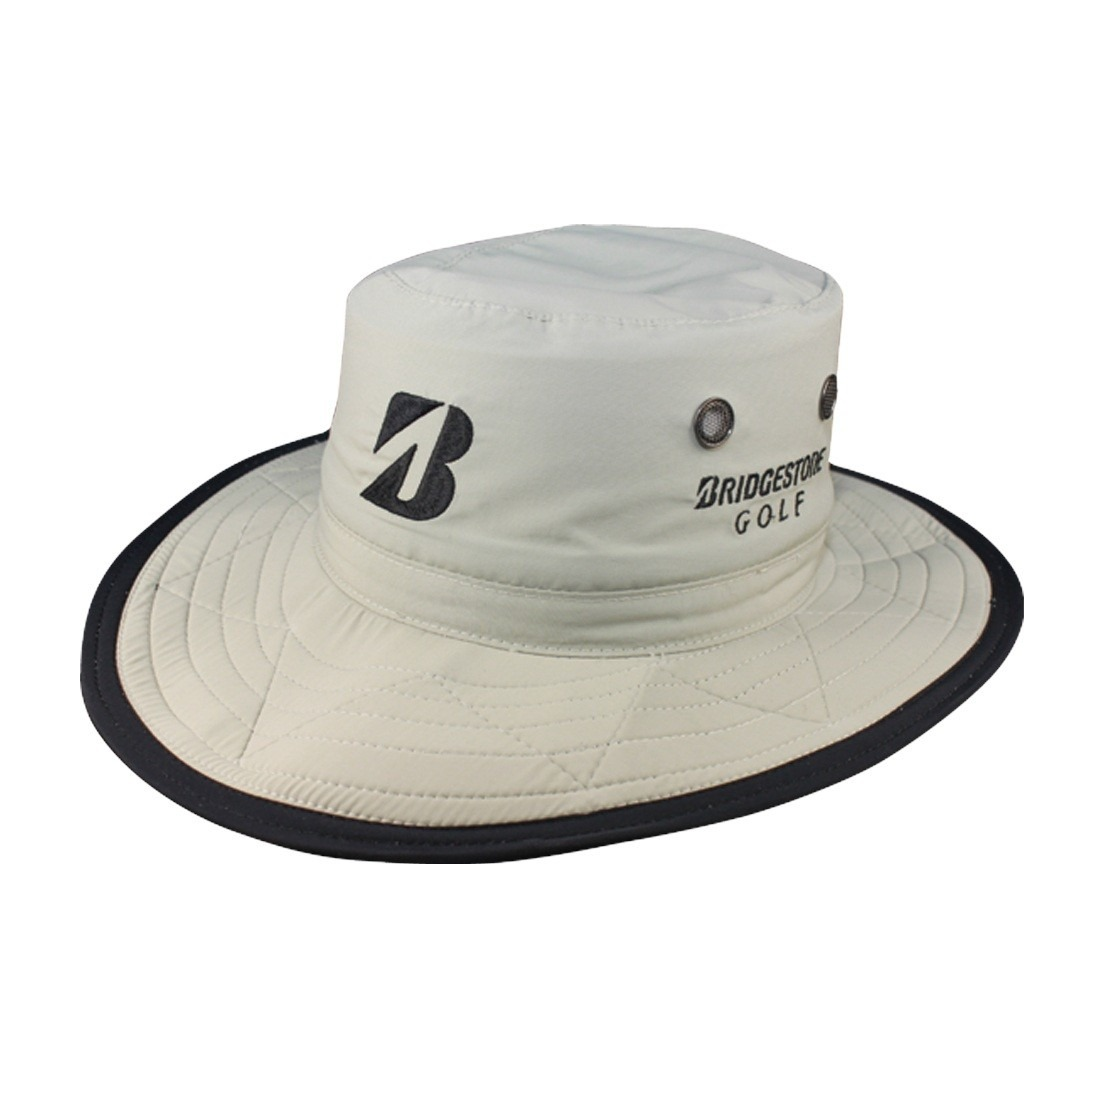 Sombrero Bridgestone Golf -   639.00 en Mercado Libre 8a83075128a